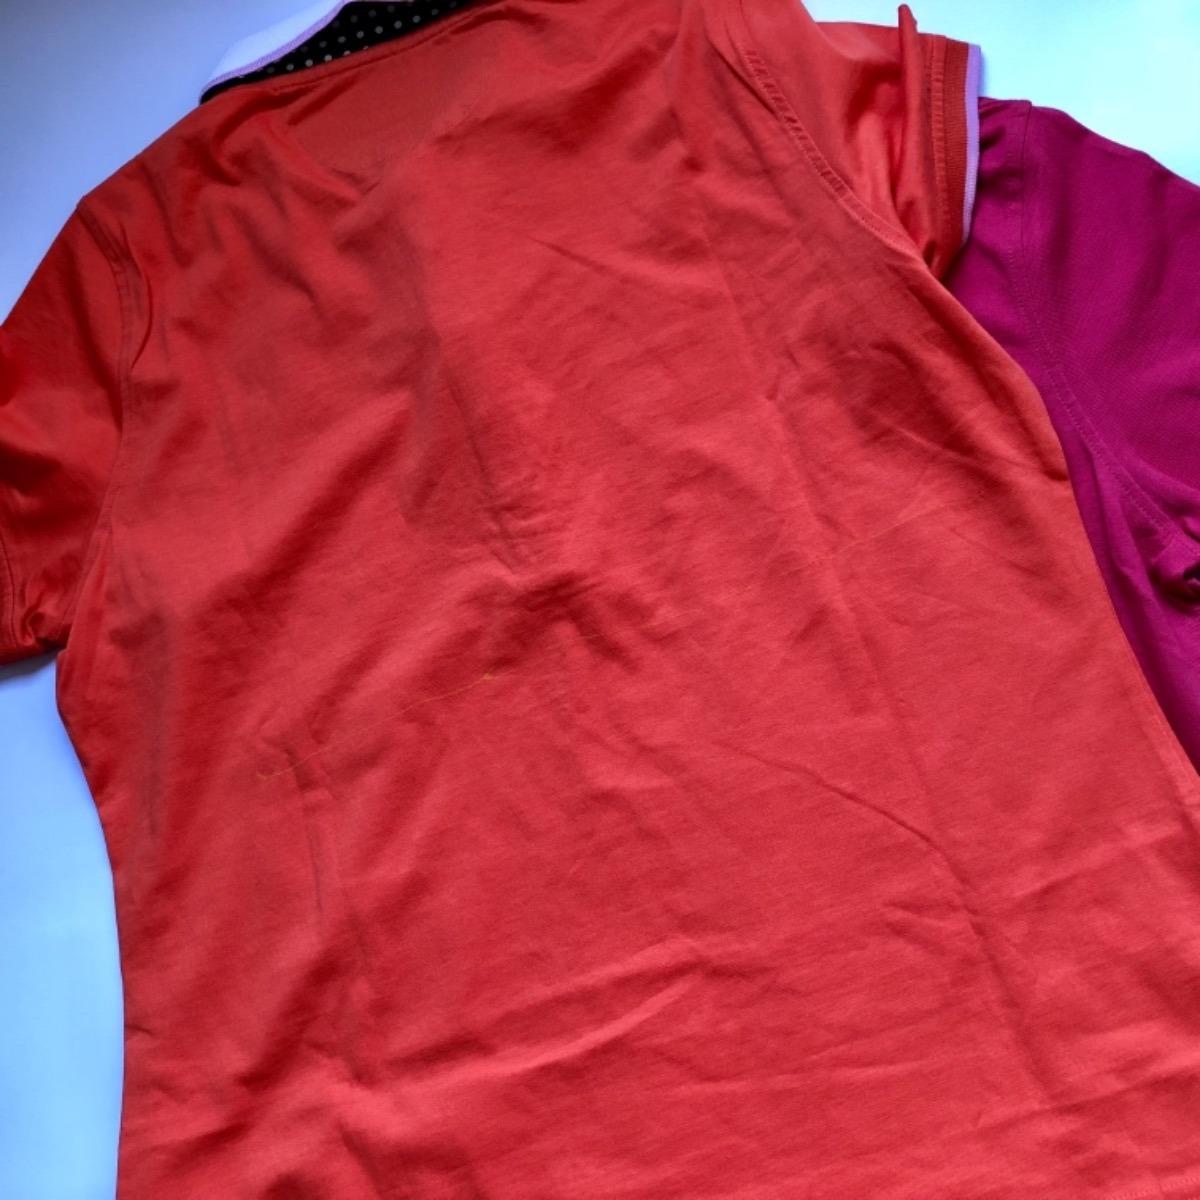 e6fac63cfb kit 2 camisa polo feminina dudalina original pequeno defeito. Carregando  zoom.